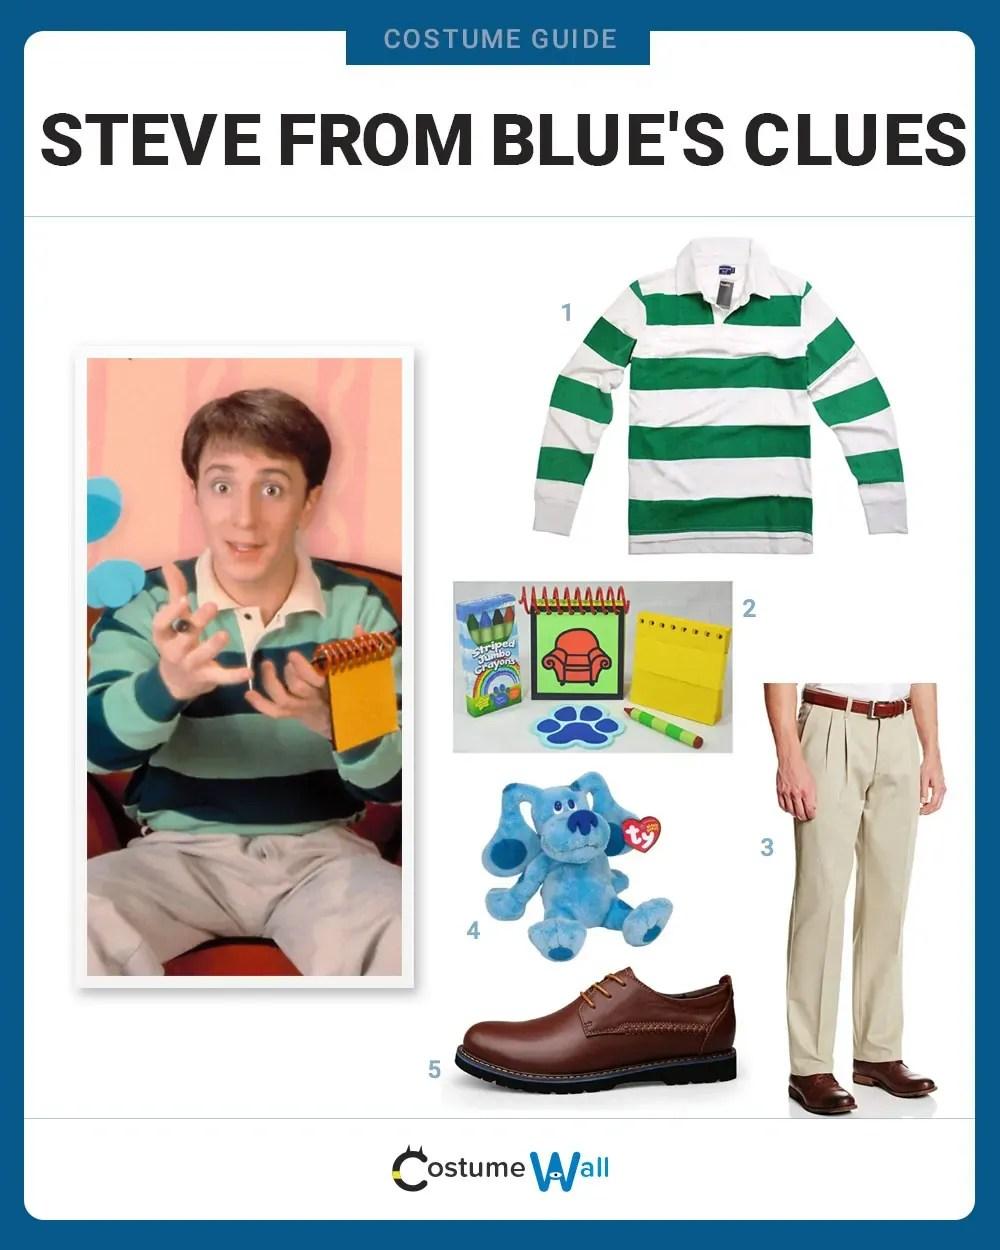 Blue Clues Halloween : clues, halloween, Dress, Steve, Blue's, Clues, Costume, Halloween, Cosplay, Guides